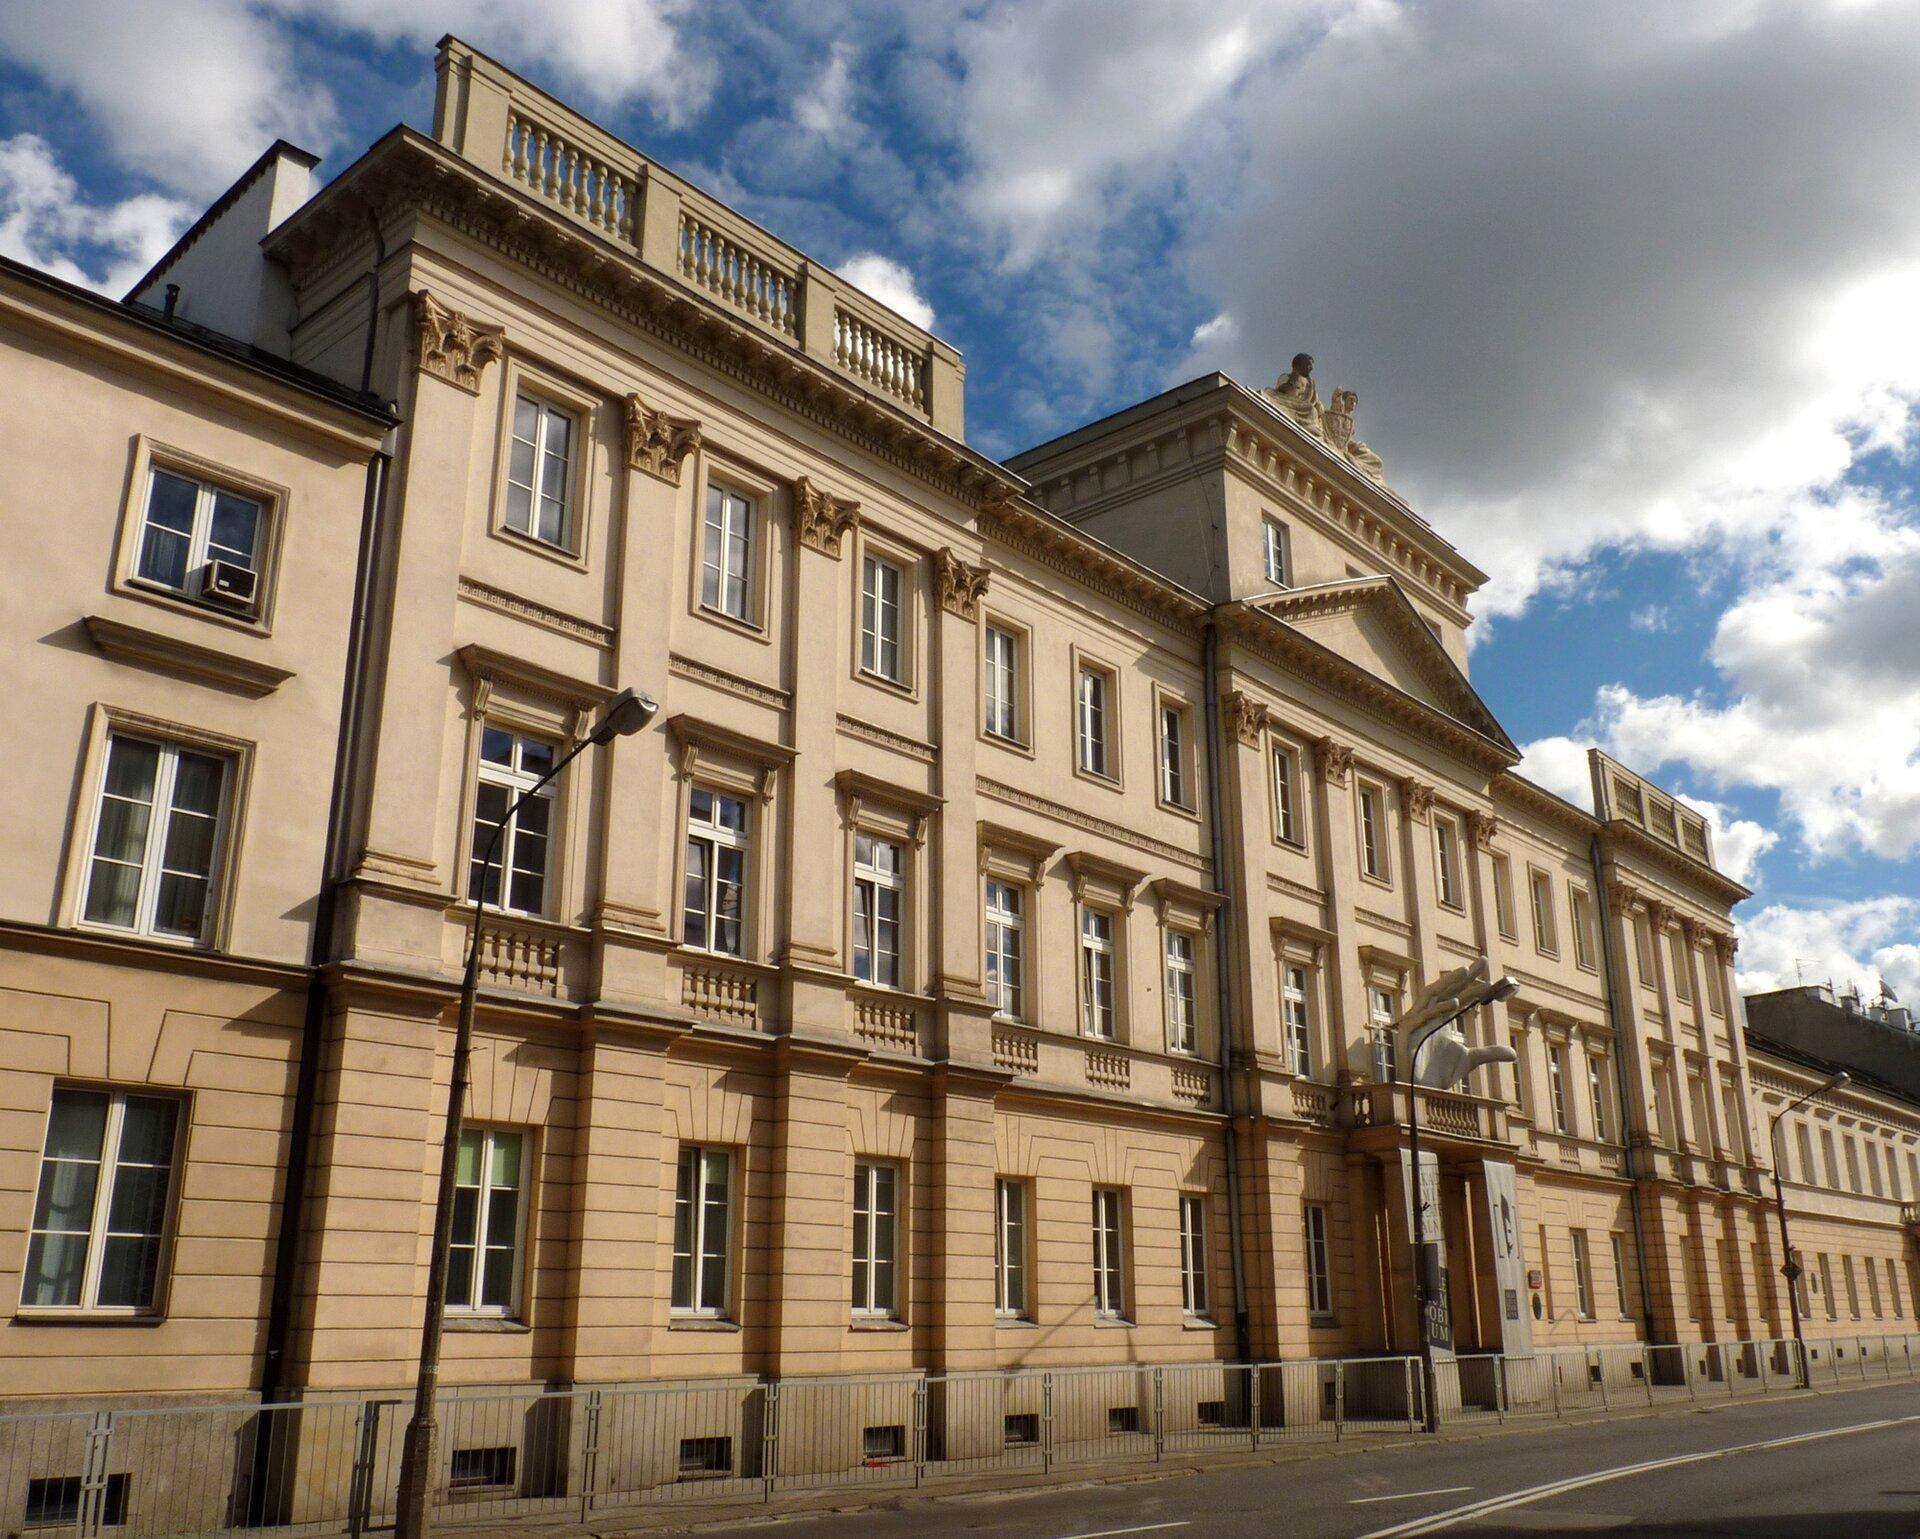 Collegium Nobilium Budynek, wktórym mieściła się szkoła pijarów Collegium Nobilium. Źródło: Olekwarszawiak, Collegium Nobilium, licencja: CC BY-SA 3.0.